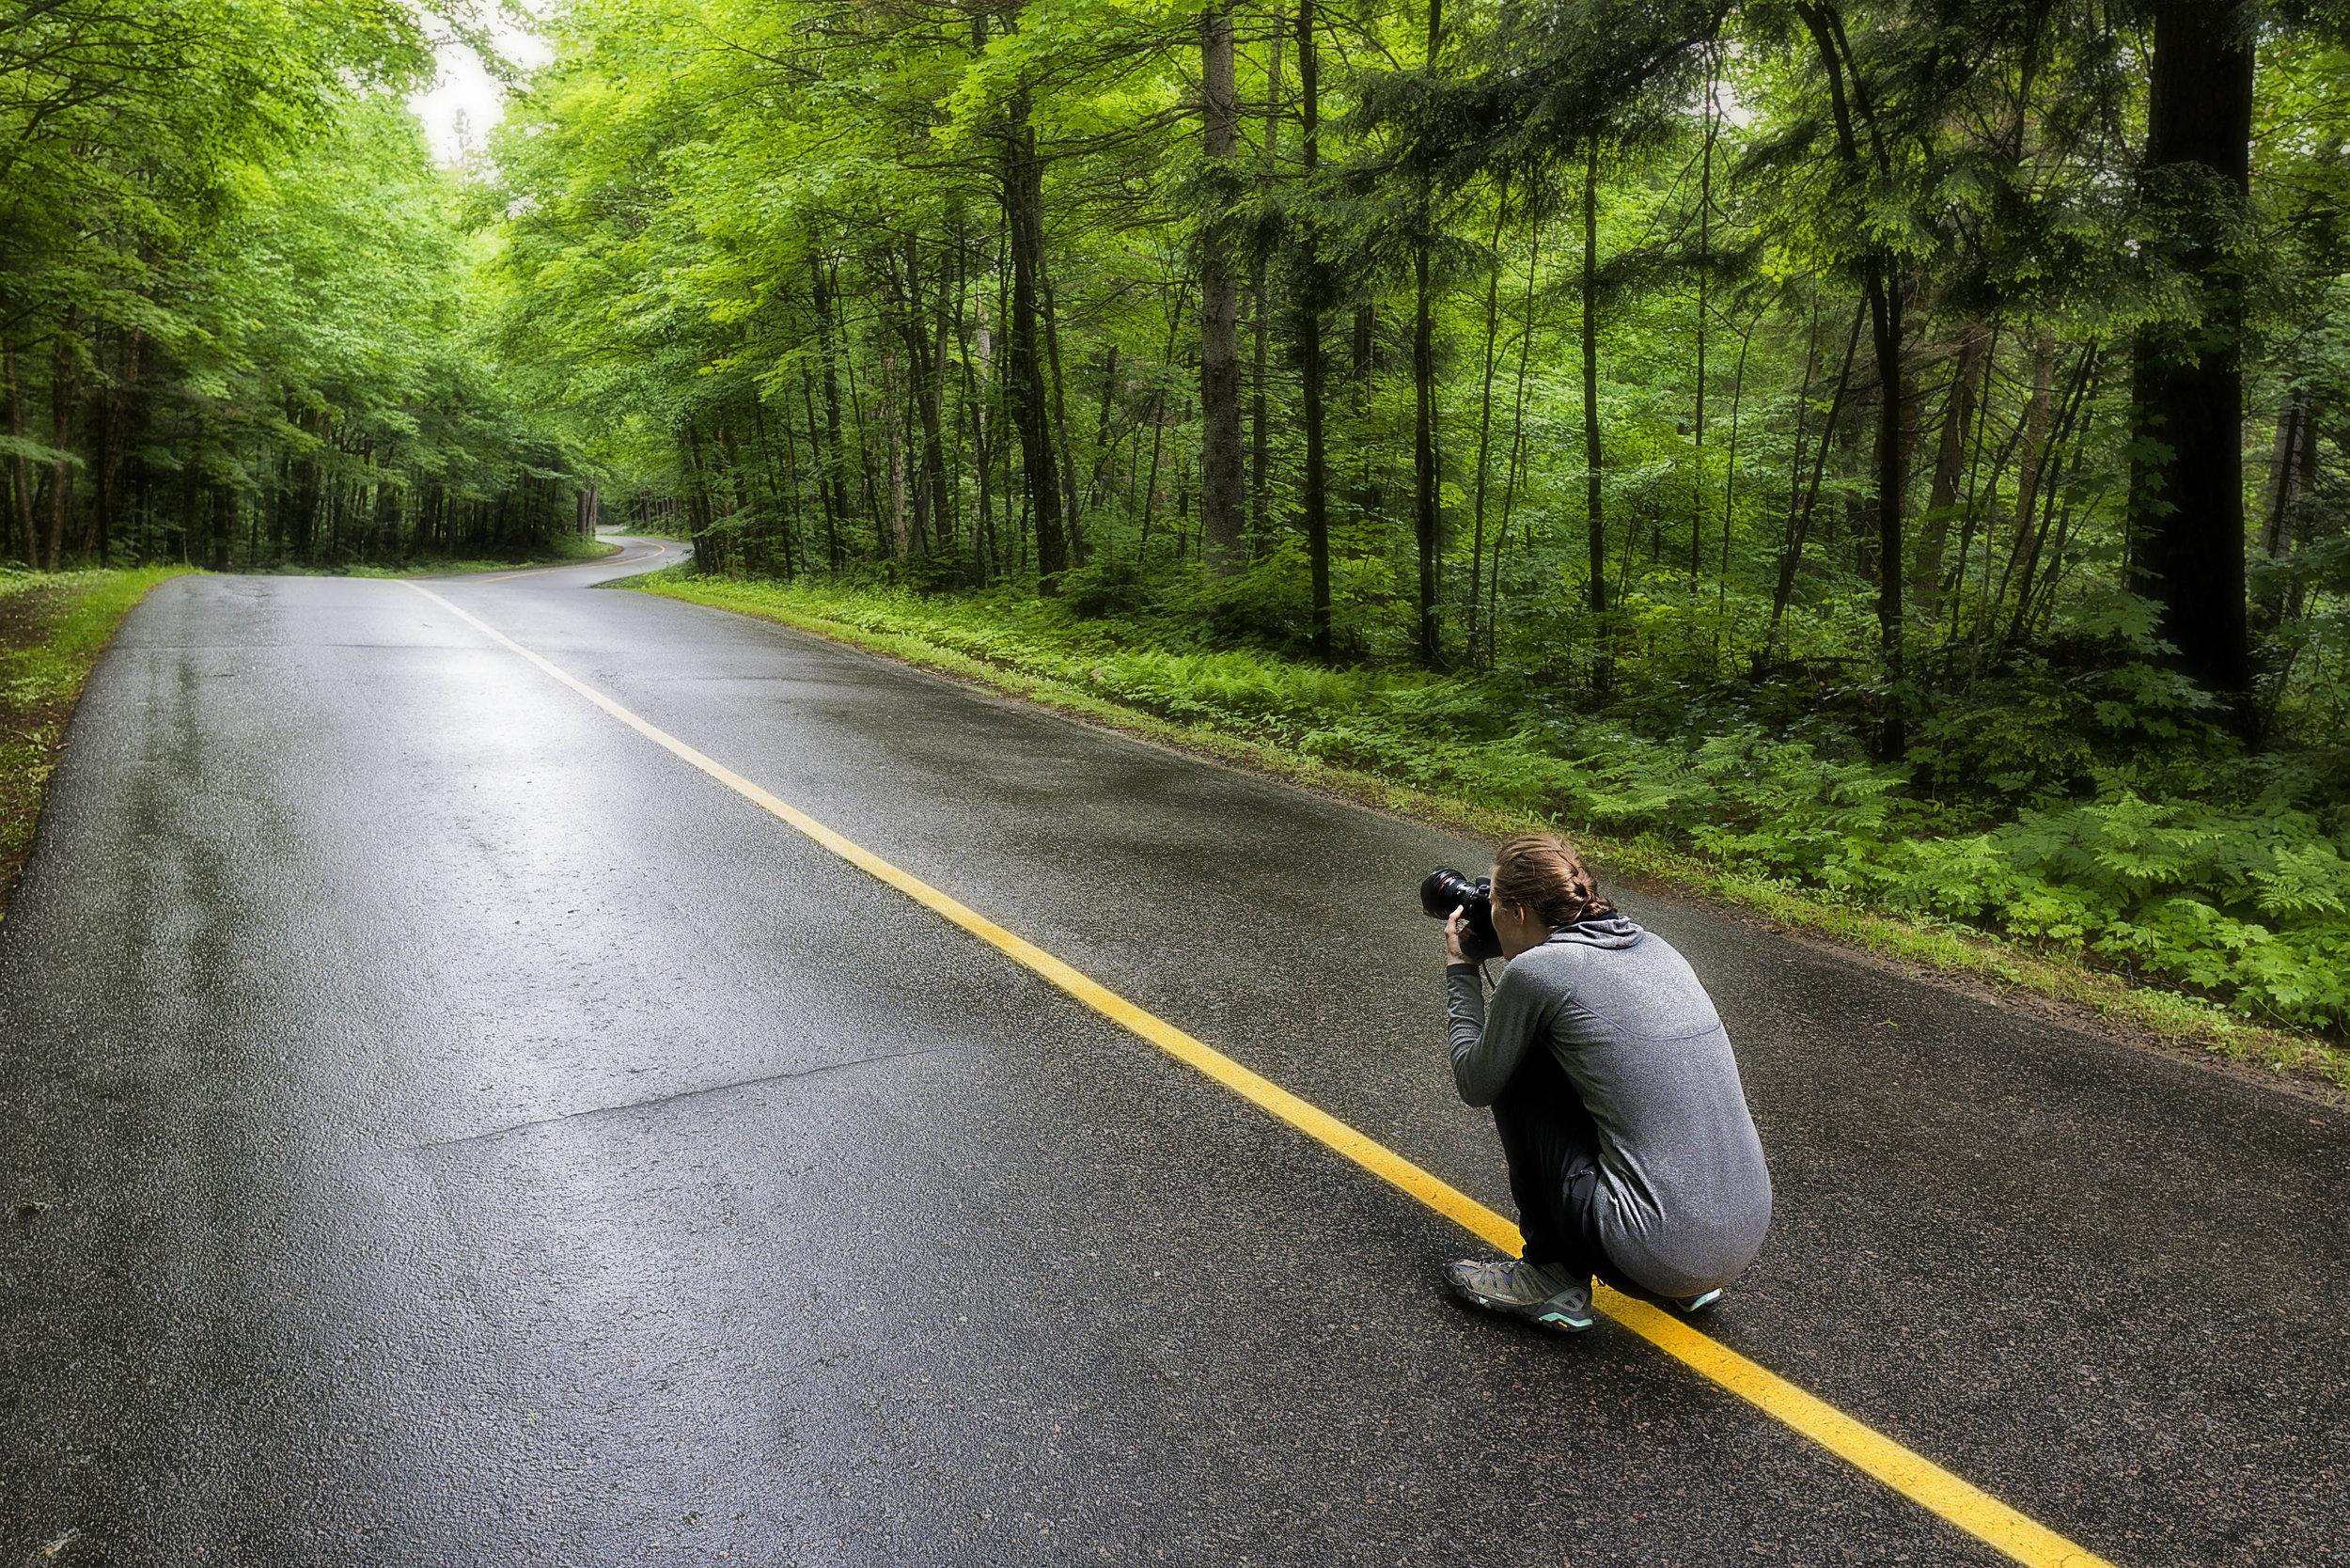 Forest Self Portrait - Across the Blue Planet